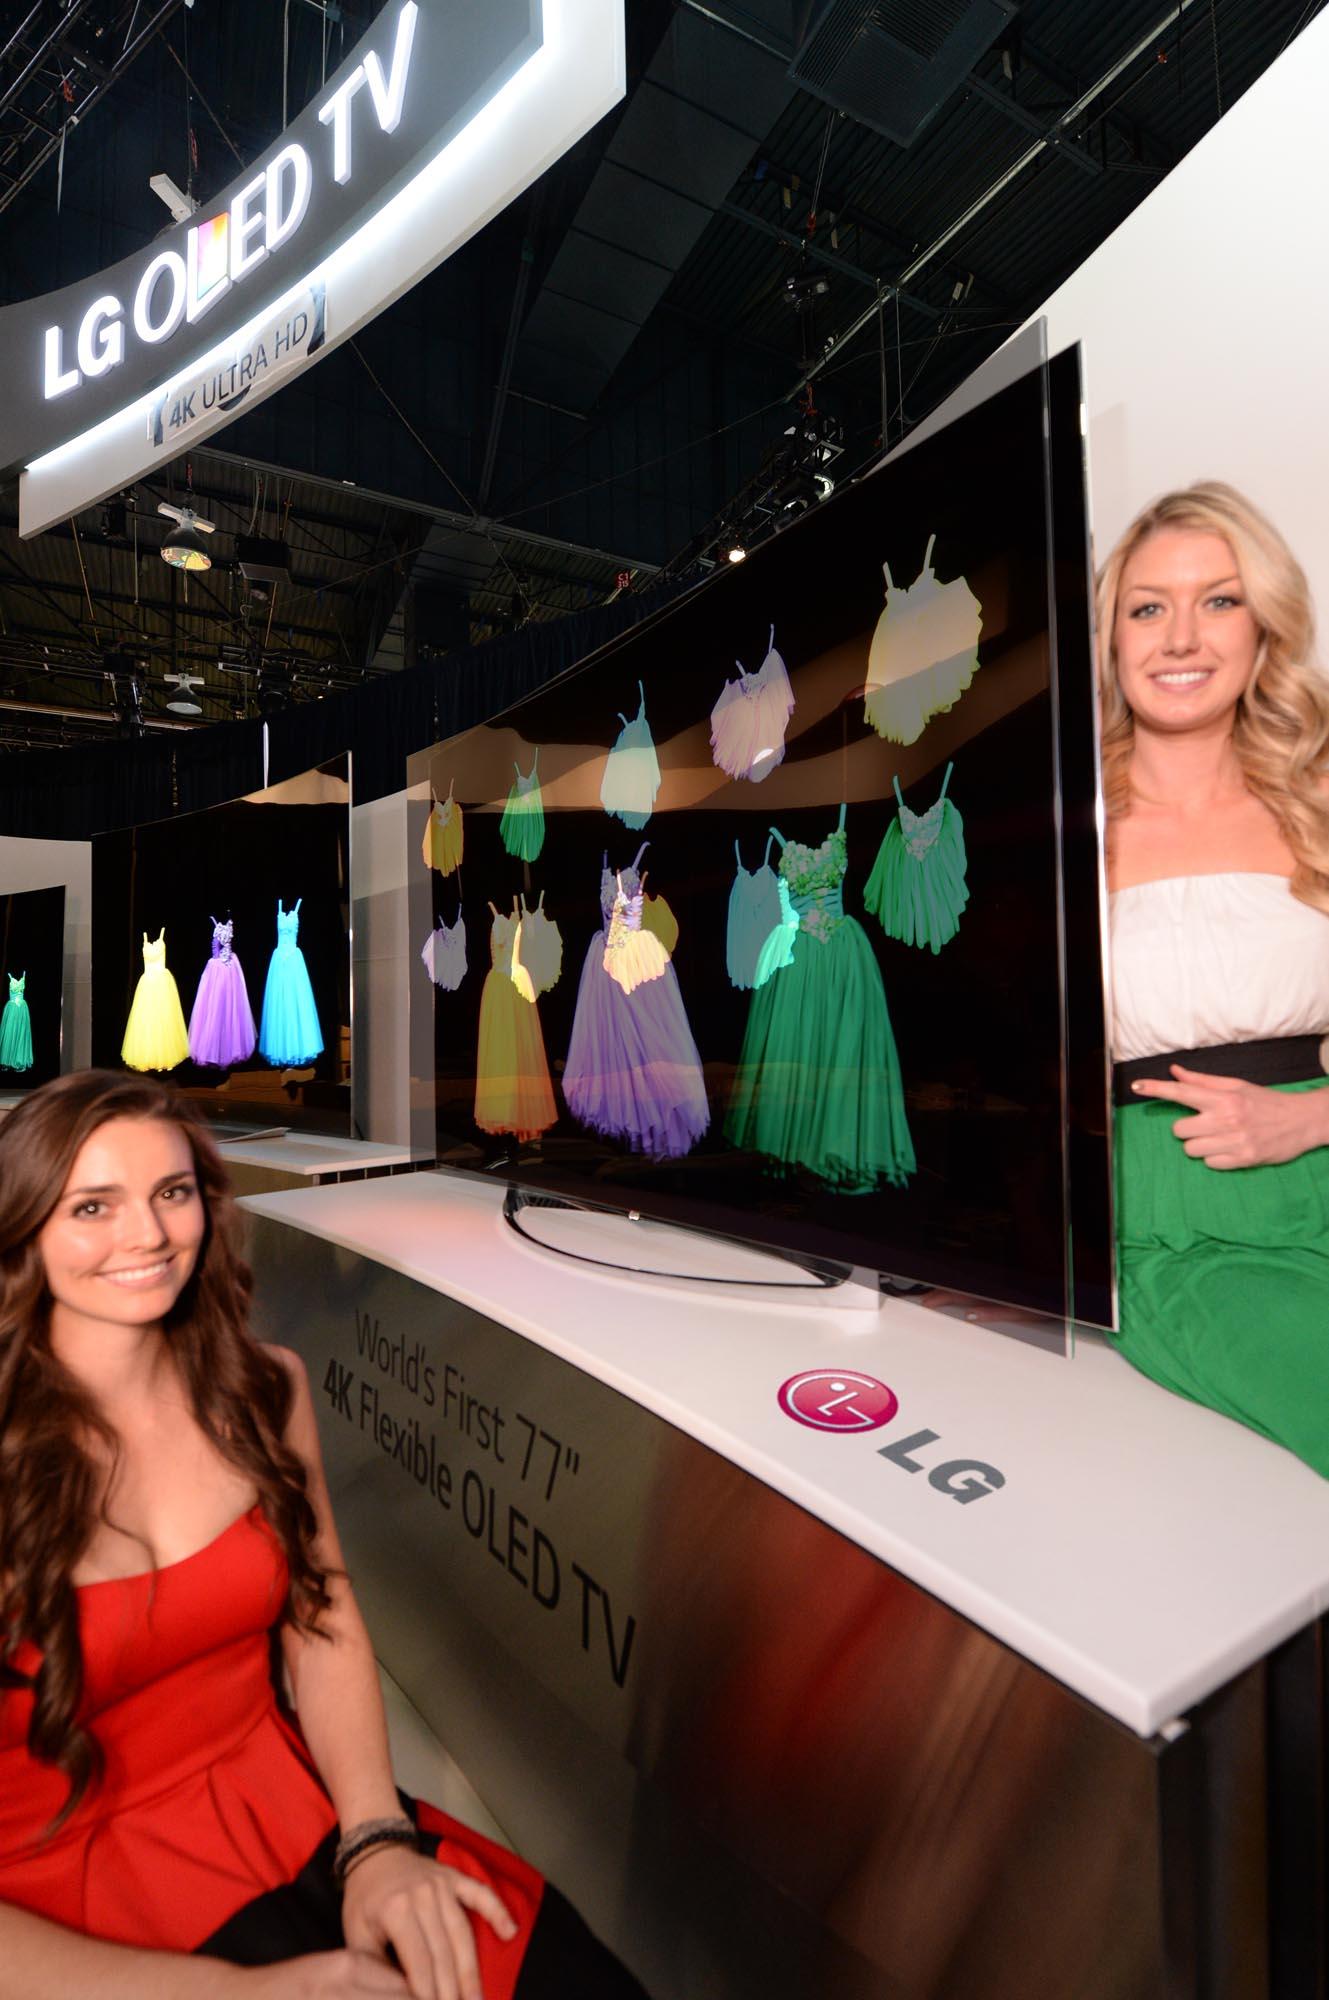 [CES 2014] LG zeigt flexiblen 77 Zoll OLED Smrt-TV